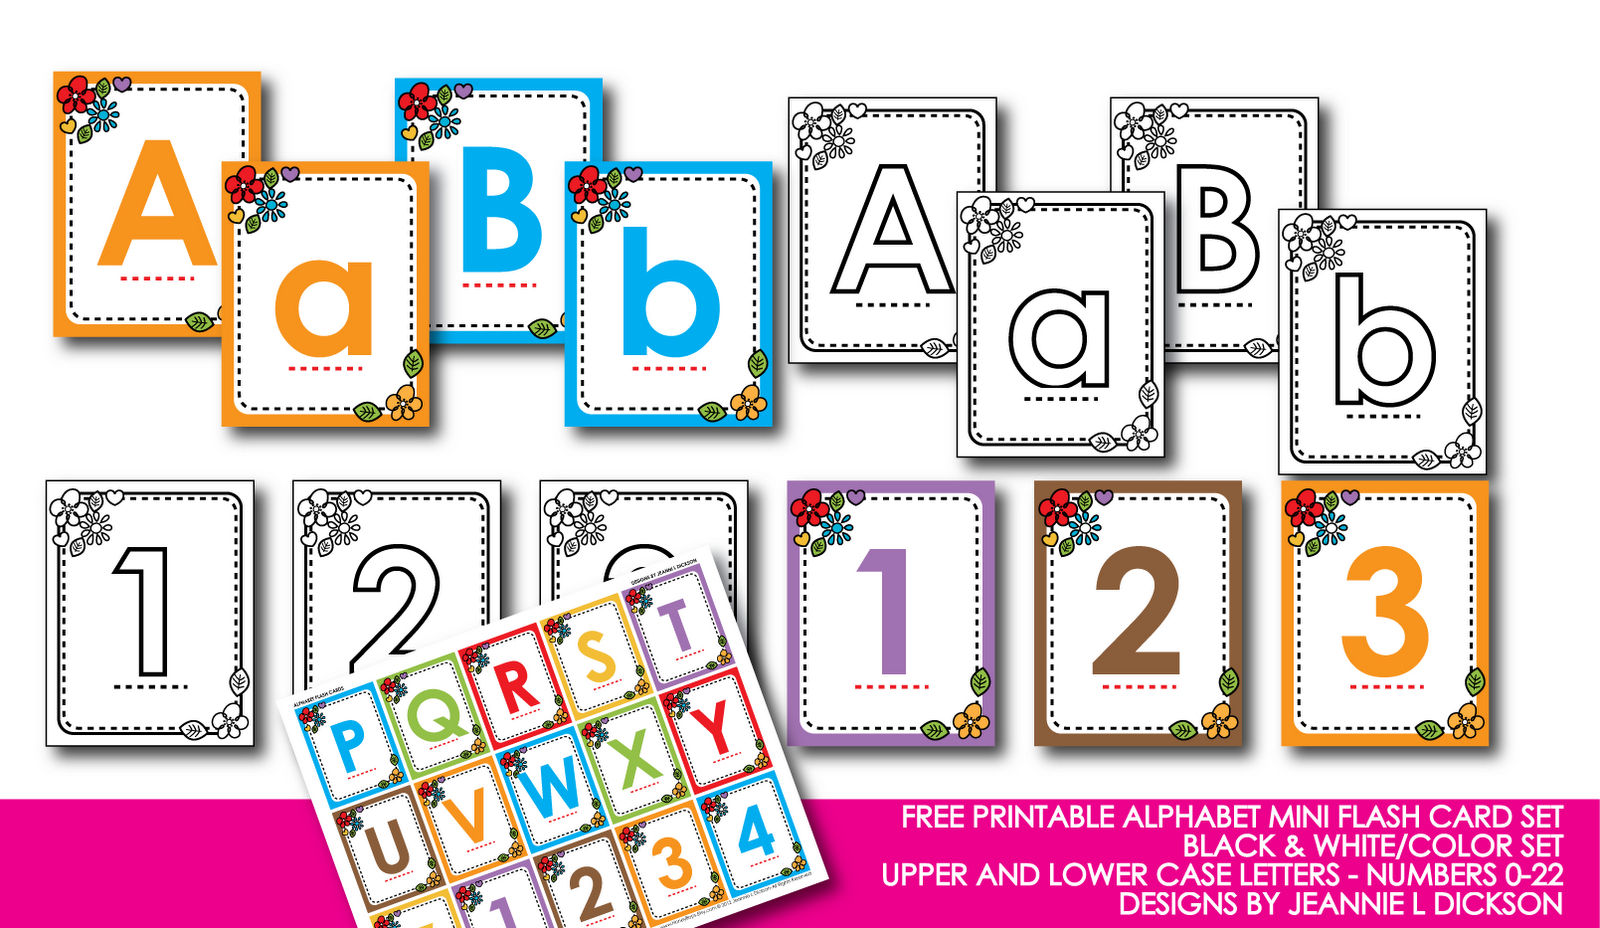 Kindergarten Alphabet Cards | Free Printable Alphabet Mini Flash - Free Printable Abc Flashcards With Pictures